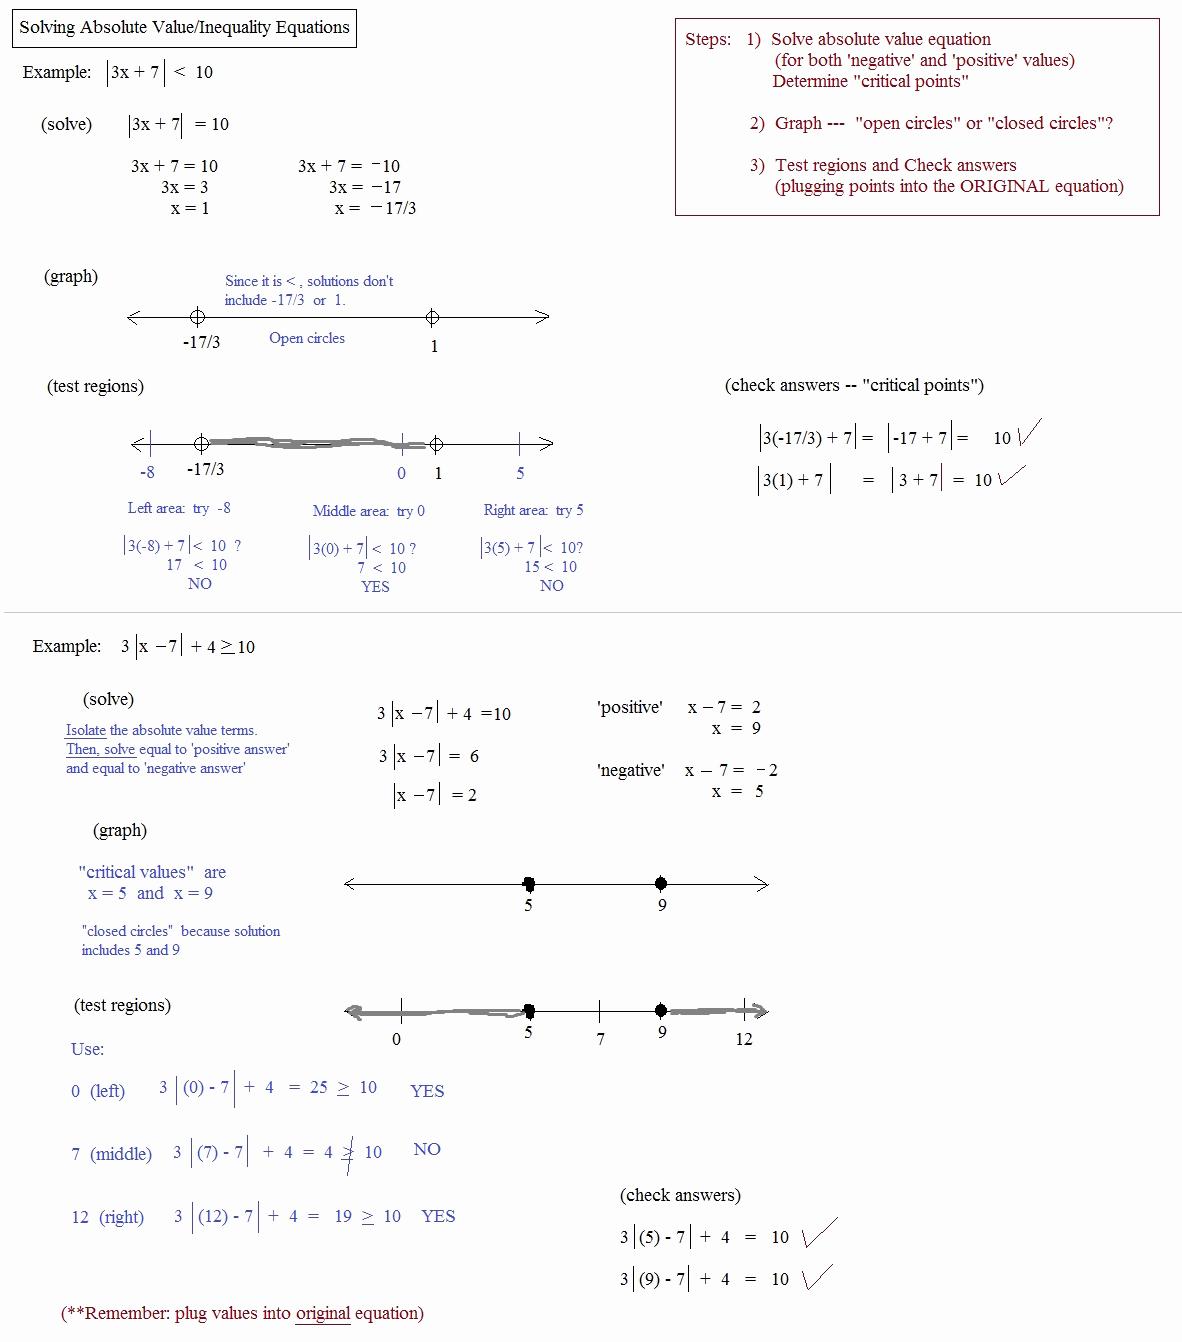 Absolute Value Inequalities Worksheet Answers Best Of Absolute Value Equations Worksheets with Answer Key